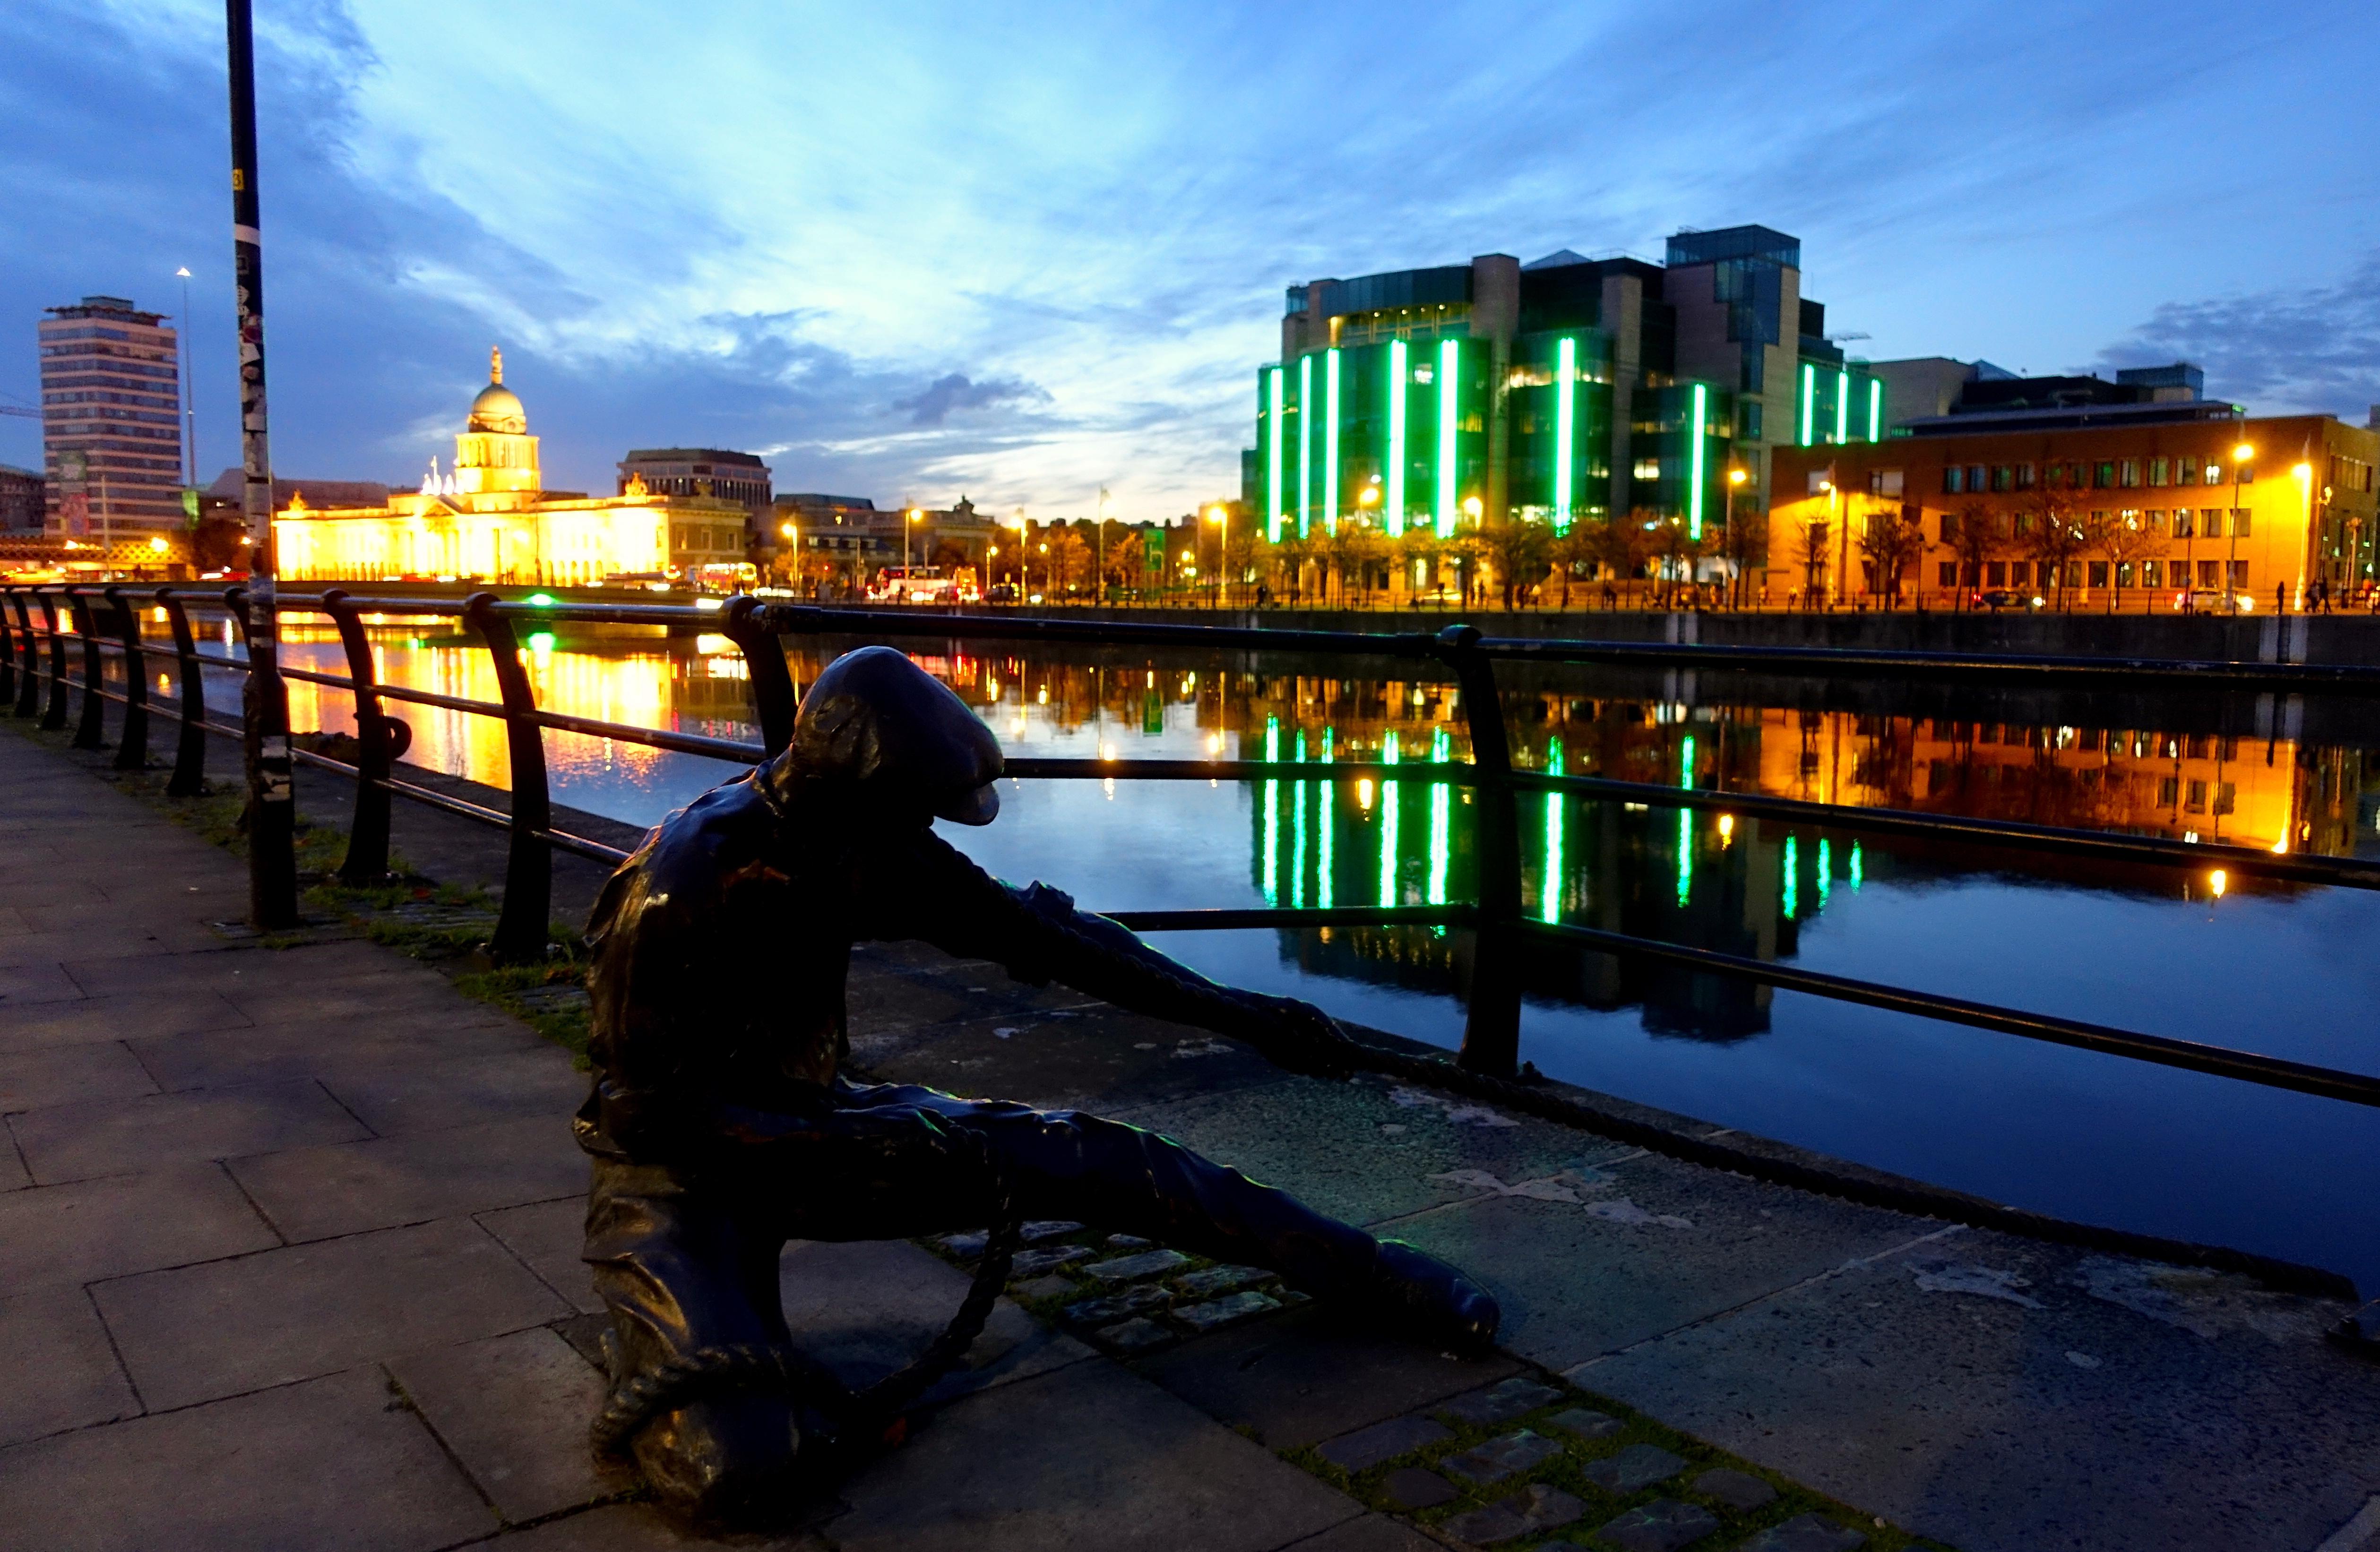 dublin-river-liffey-ireland-lustforthesublime